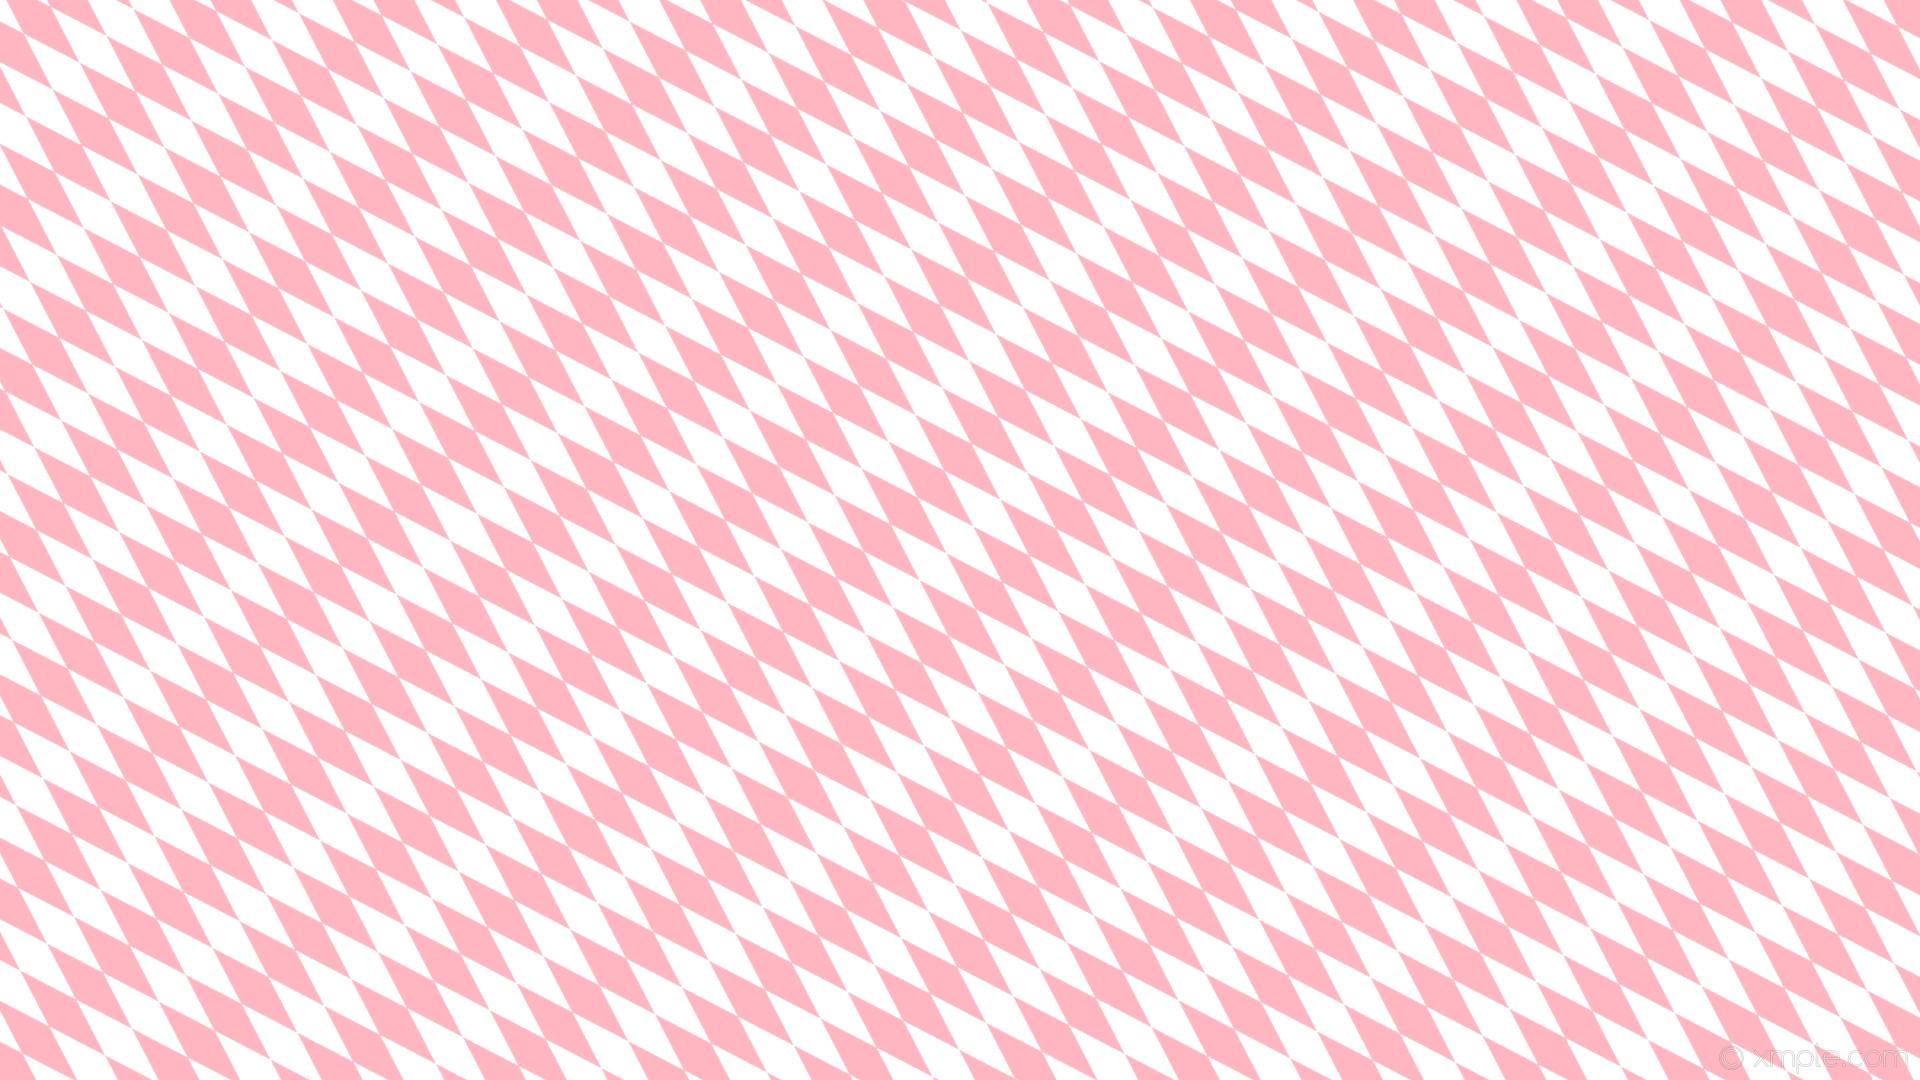 wallpaper pink diamond white lozenge rhombus light pink #ffffff #ffb6c1  135° 120px 38px